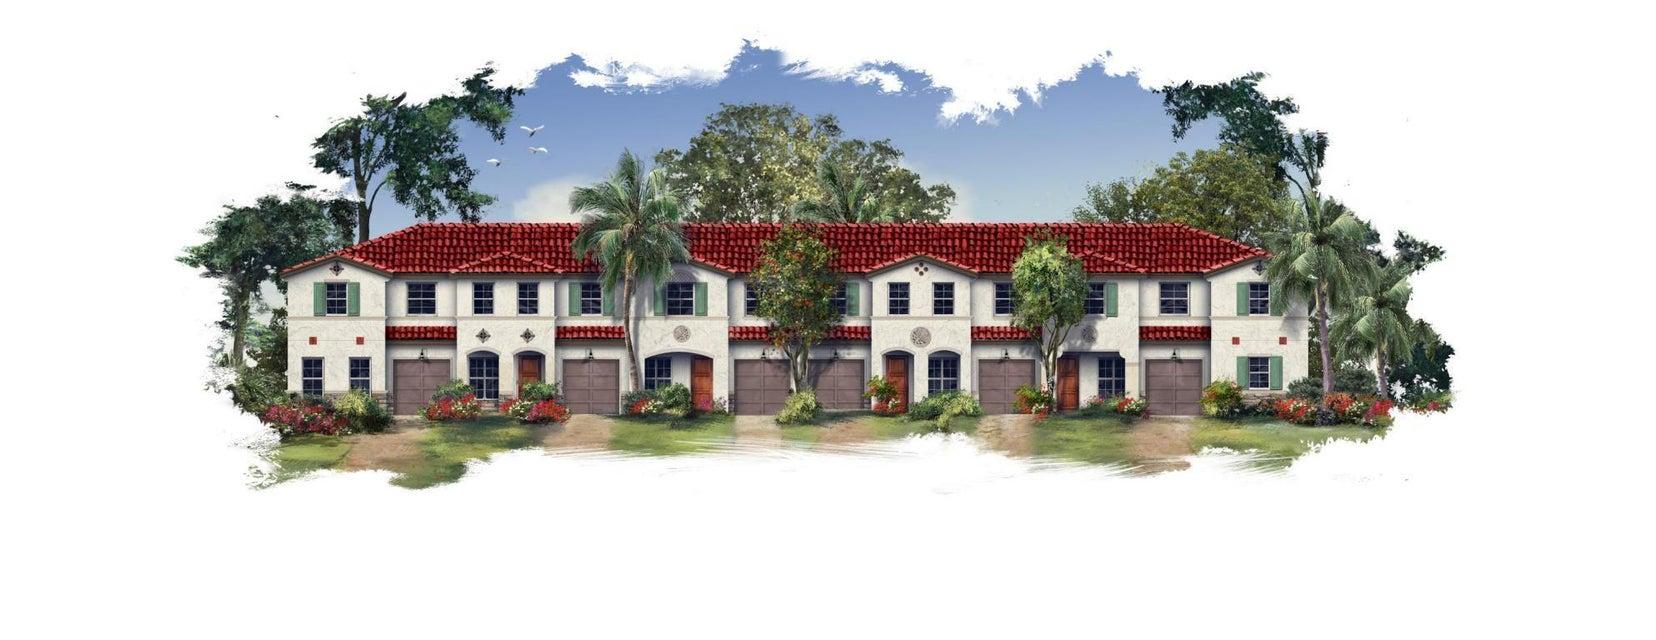 4683 Tara Cove Way, West Palm Beach, FL 33417